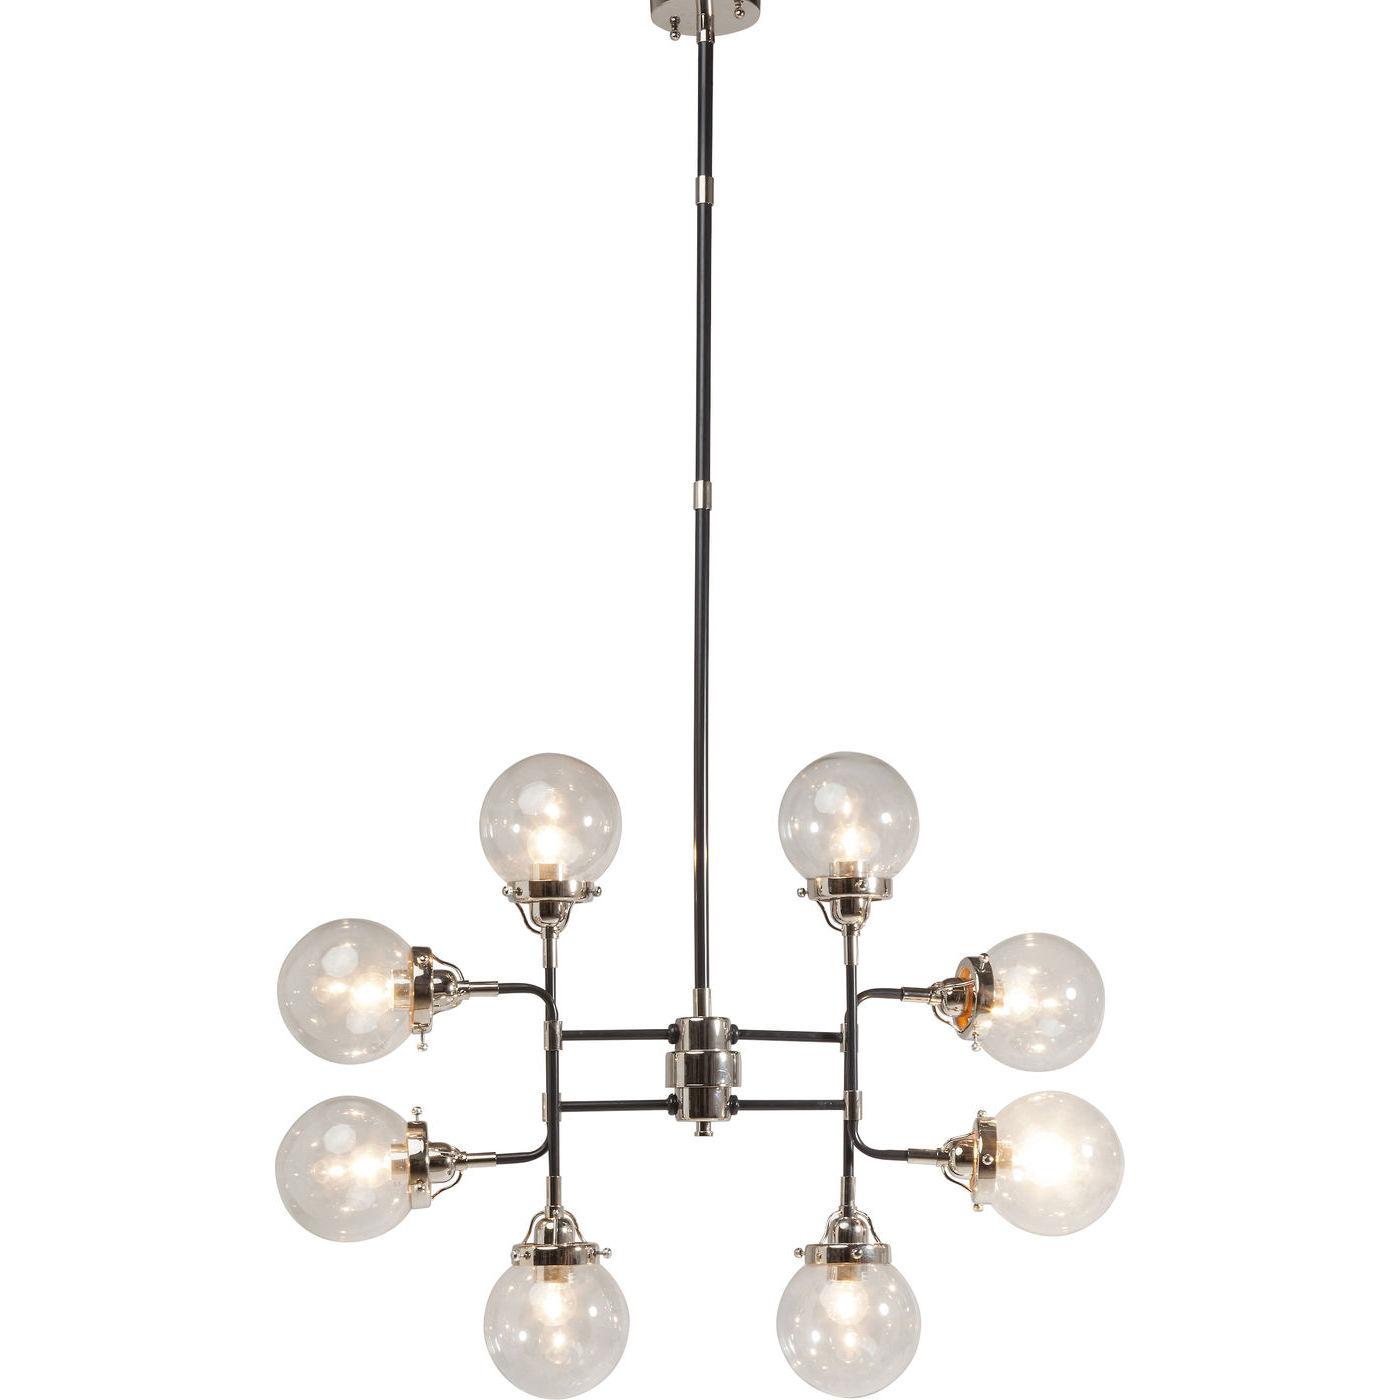 KARE DESIGN Loftslampe, Pipe Visible Eight